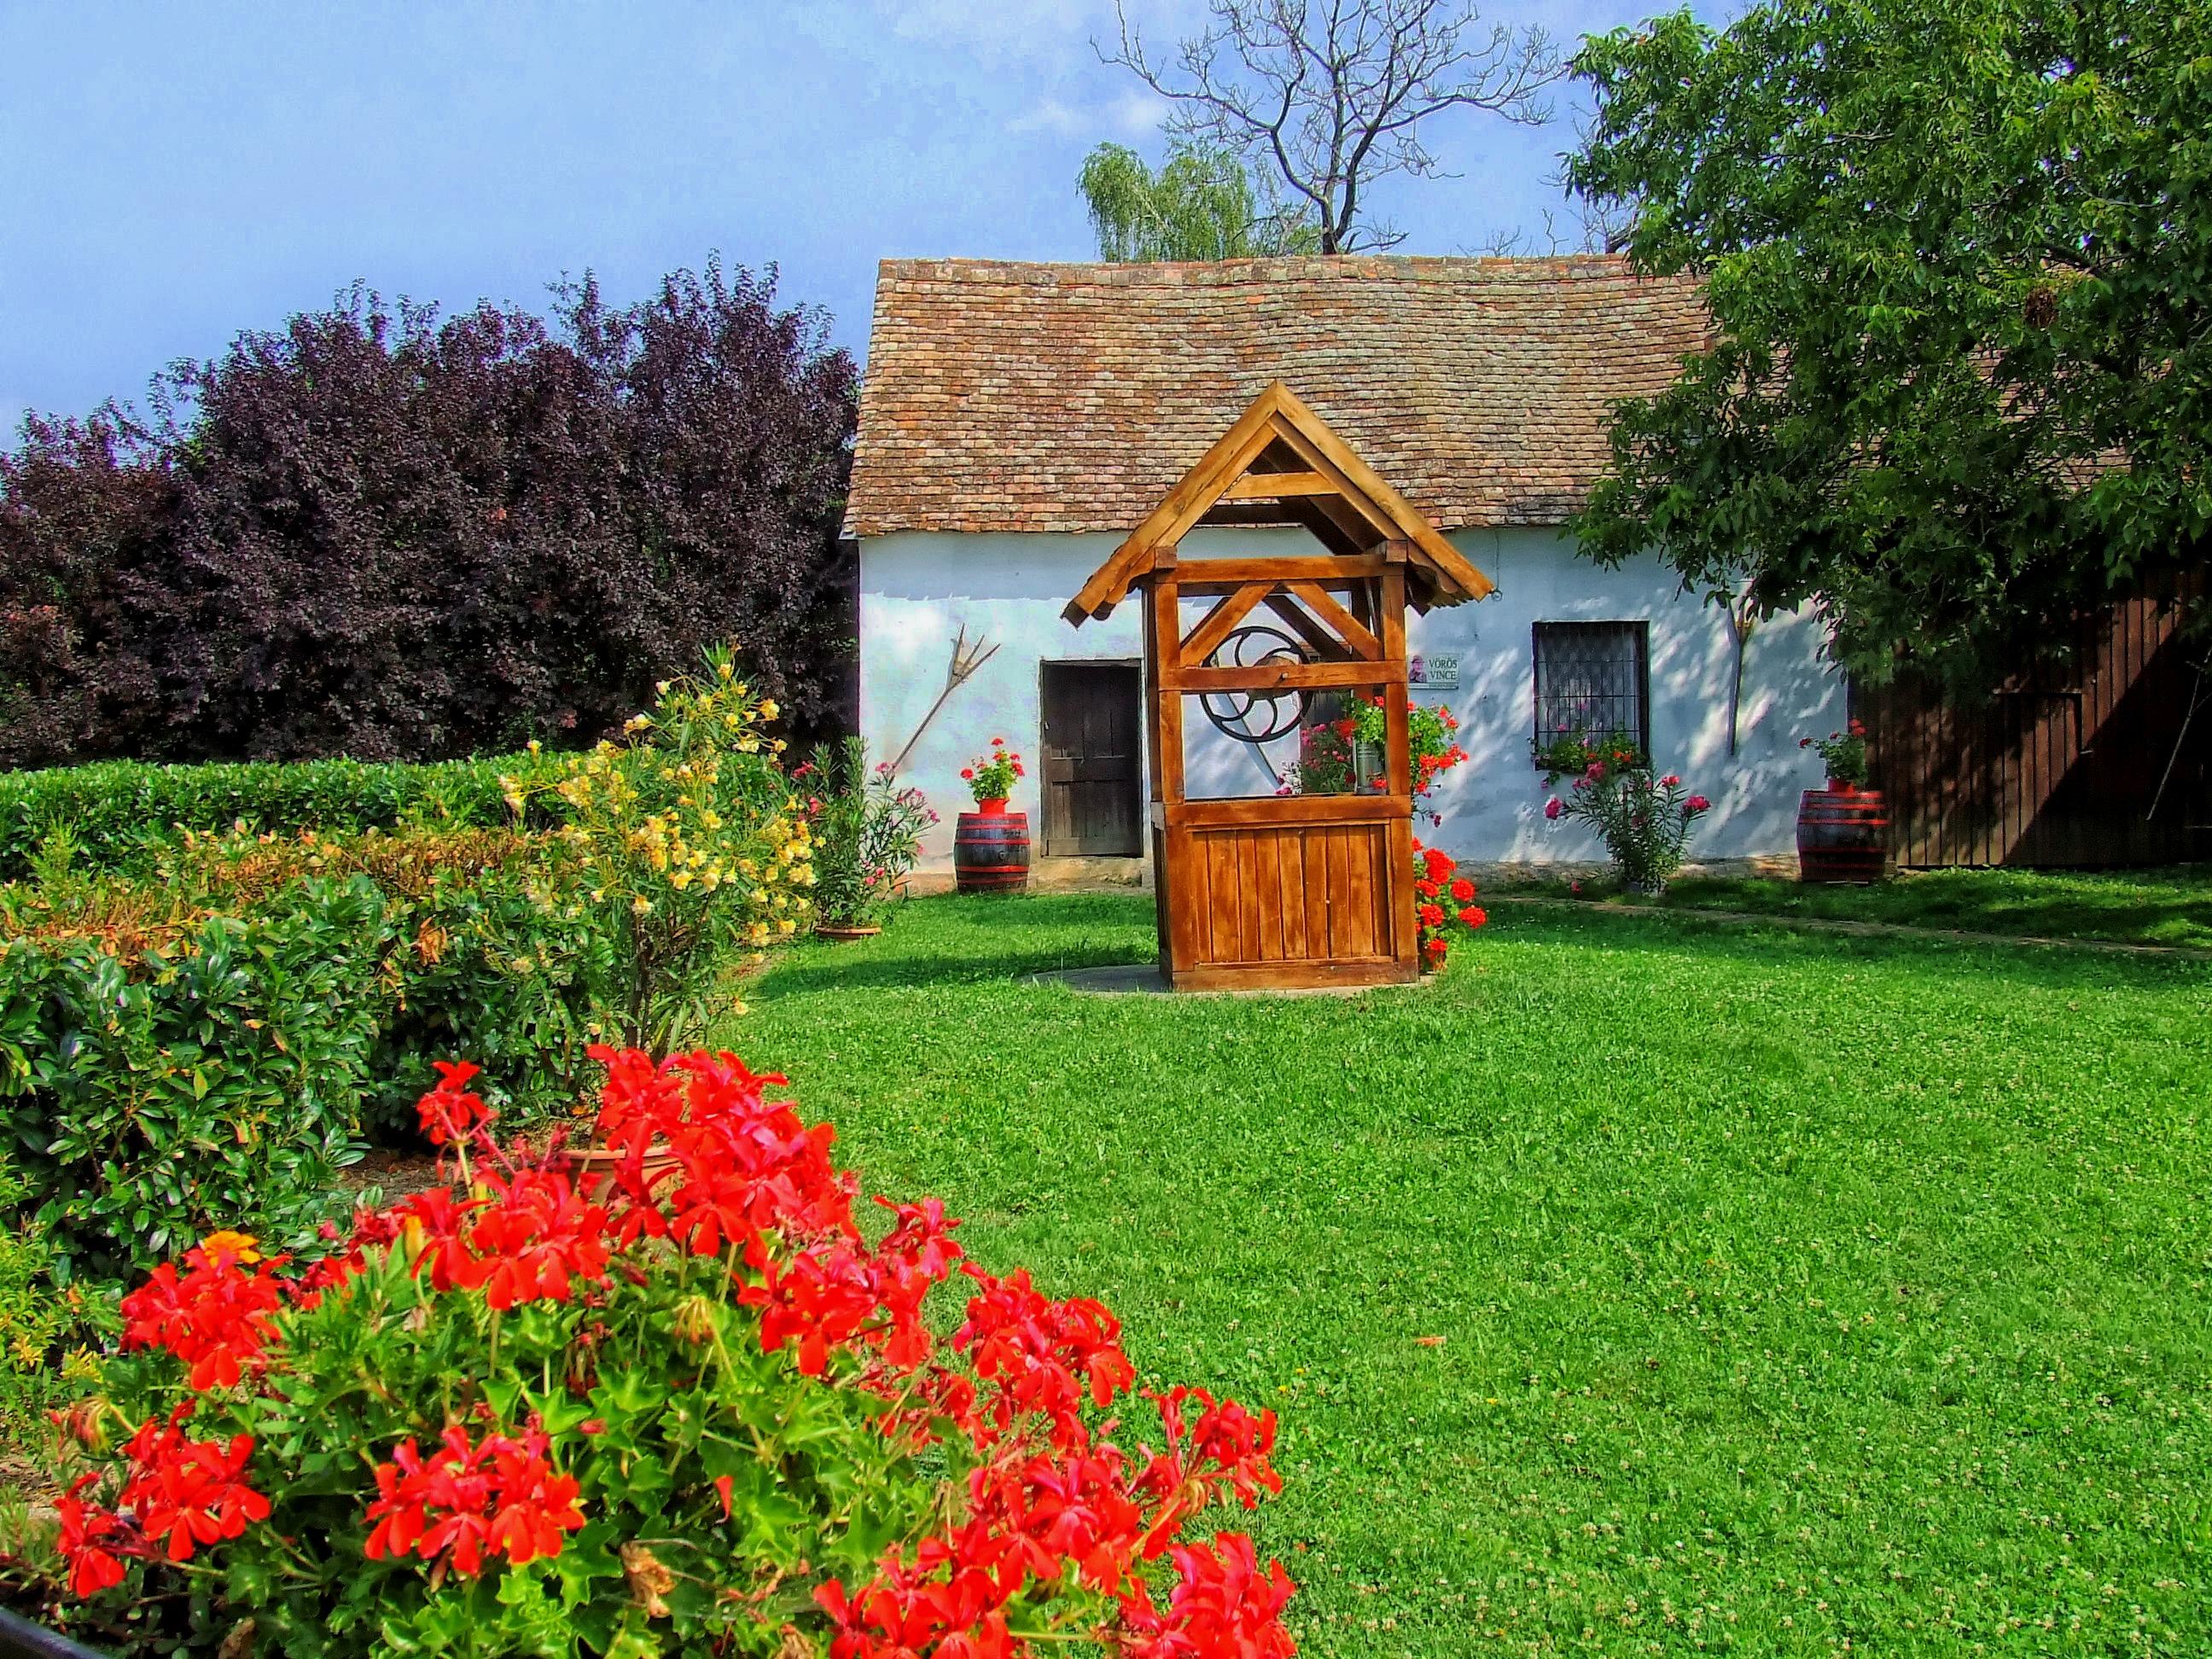 Free Images  nature, architecture, farm, lawn, house